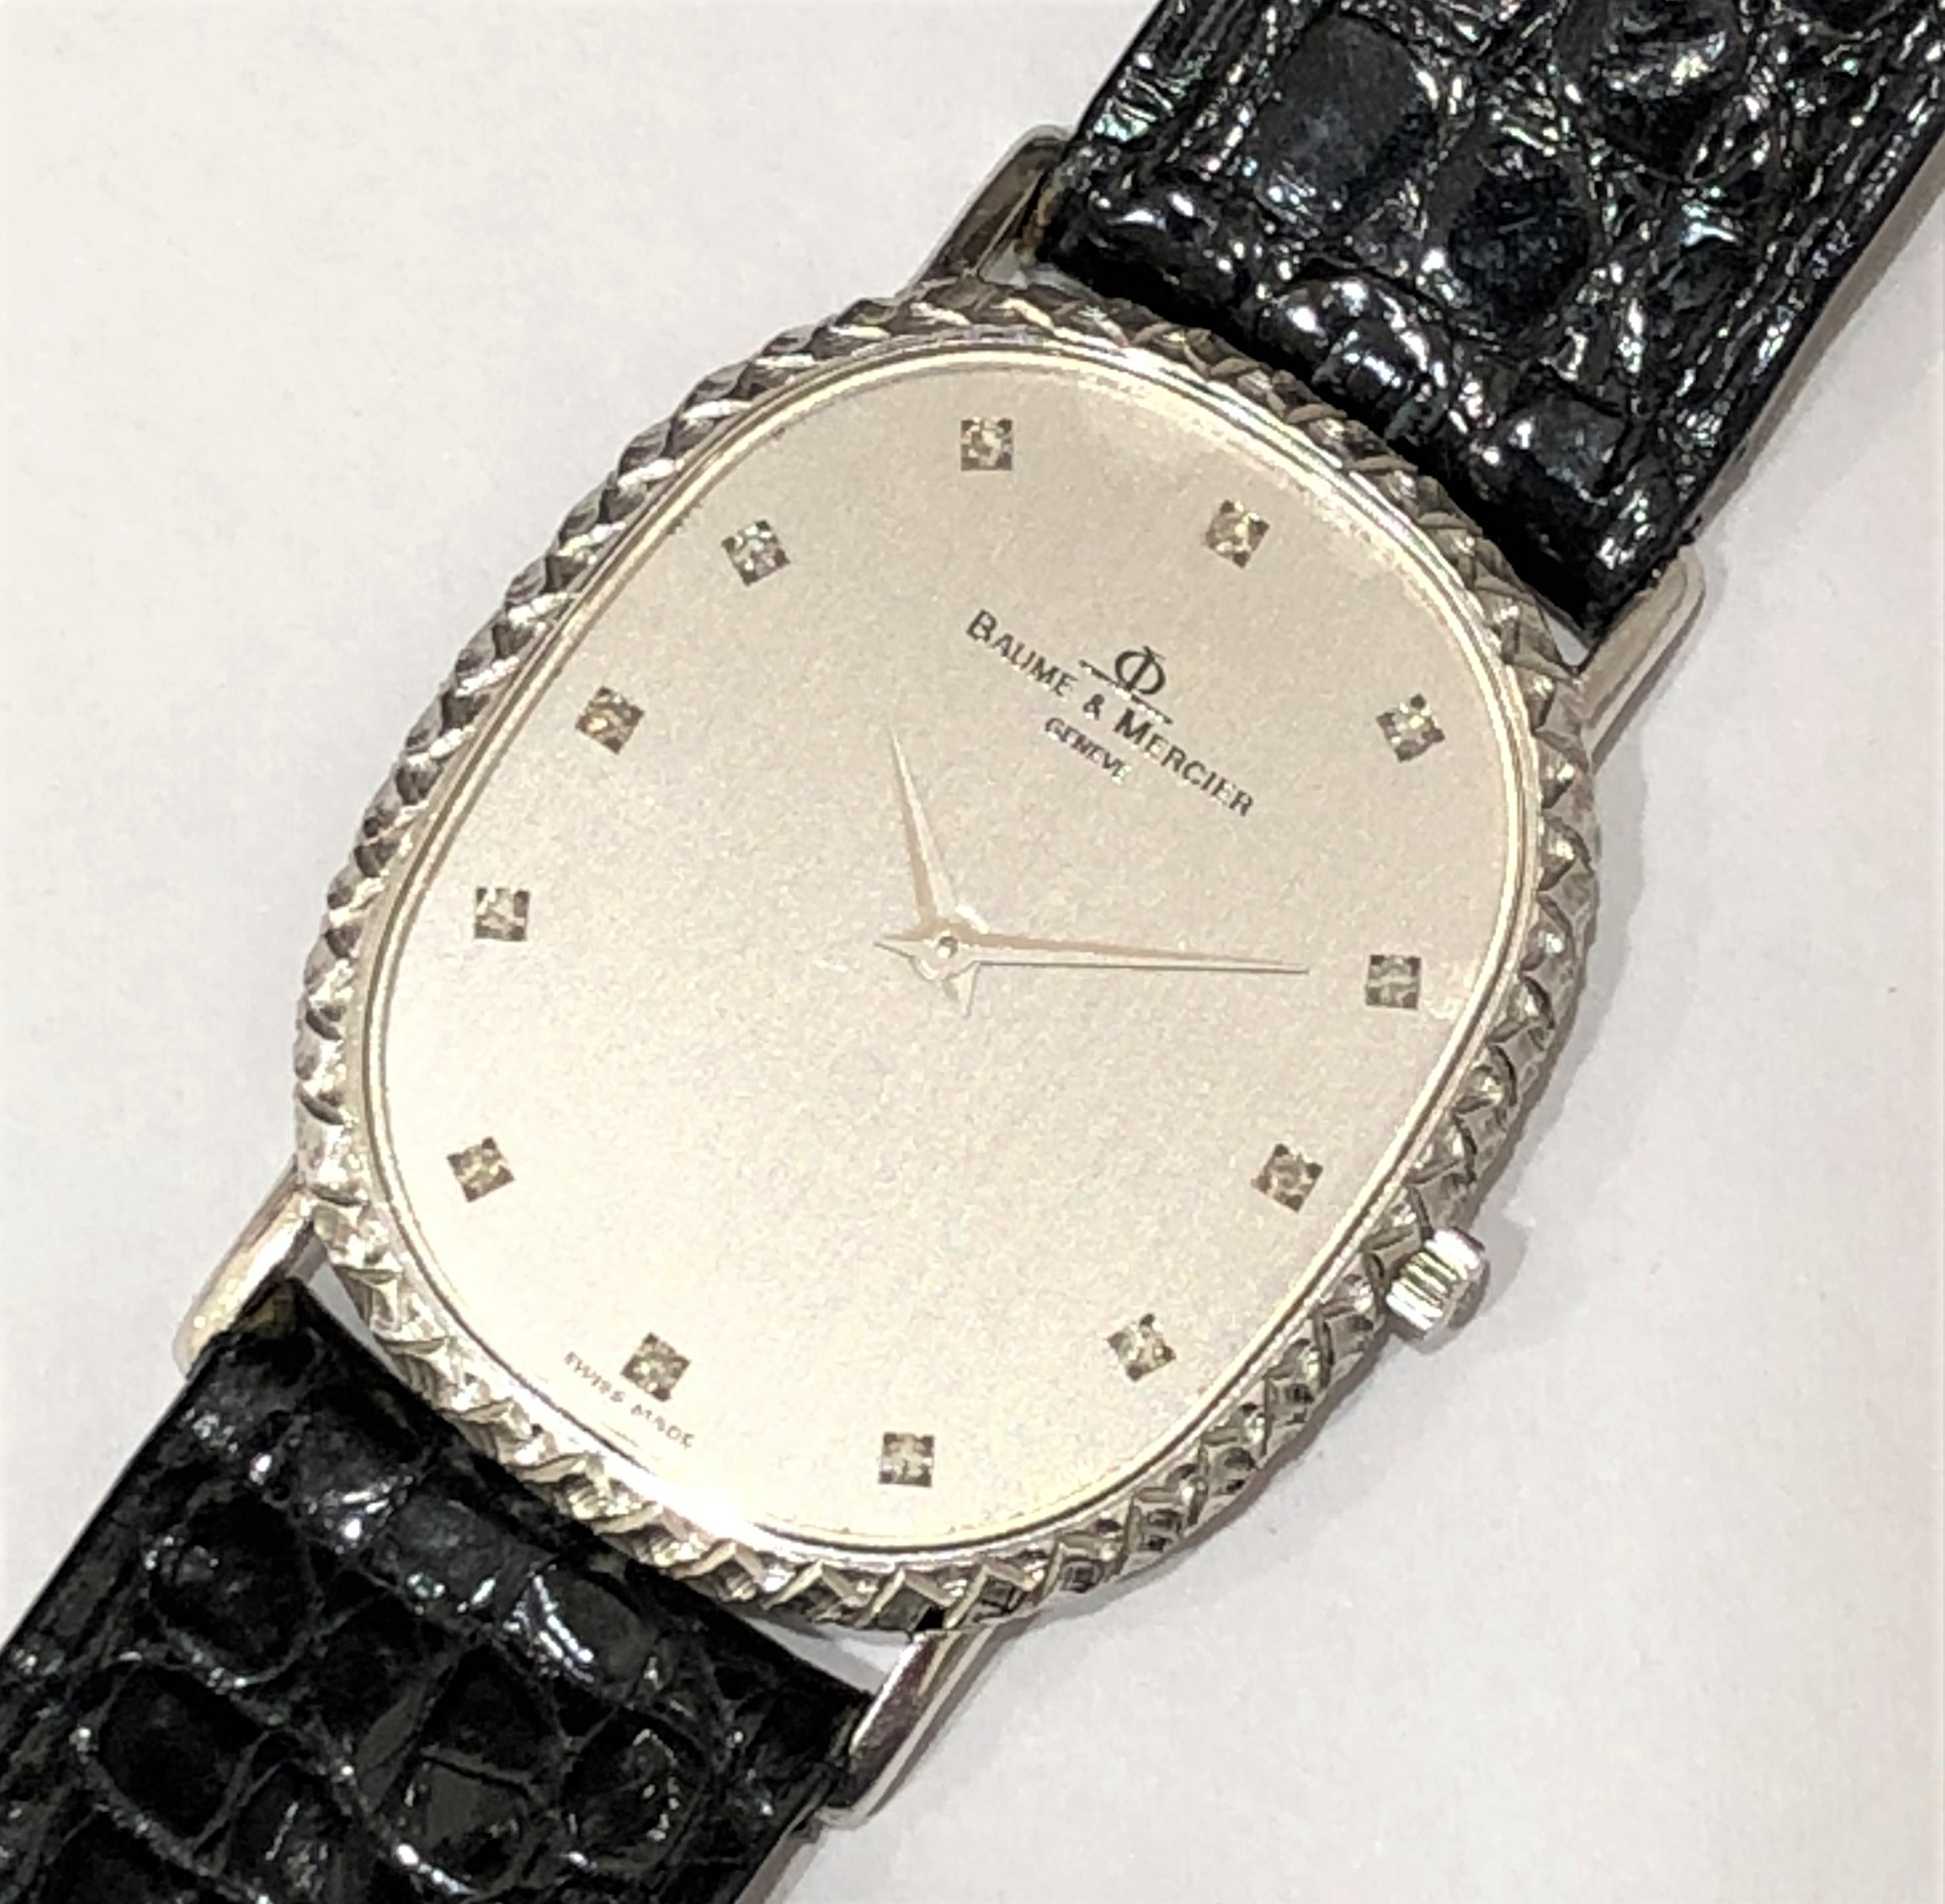 【BAUME&MERCIER/ボーム&メルイシェ】18K ダイヤ12P QZ 腕時計